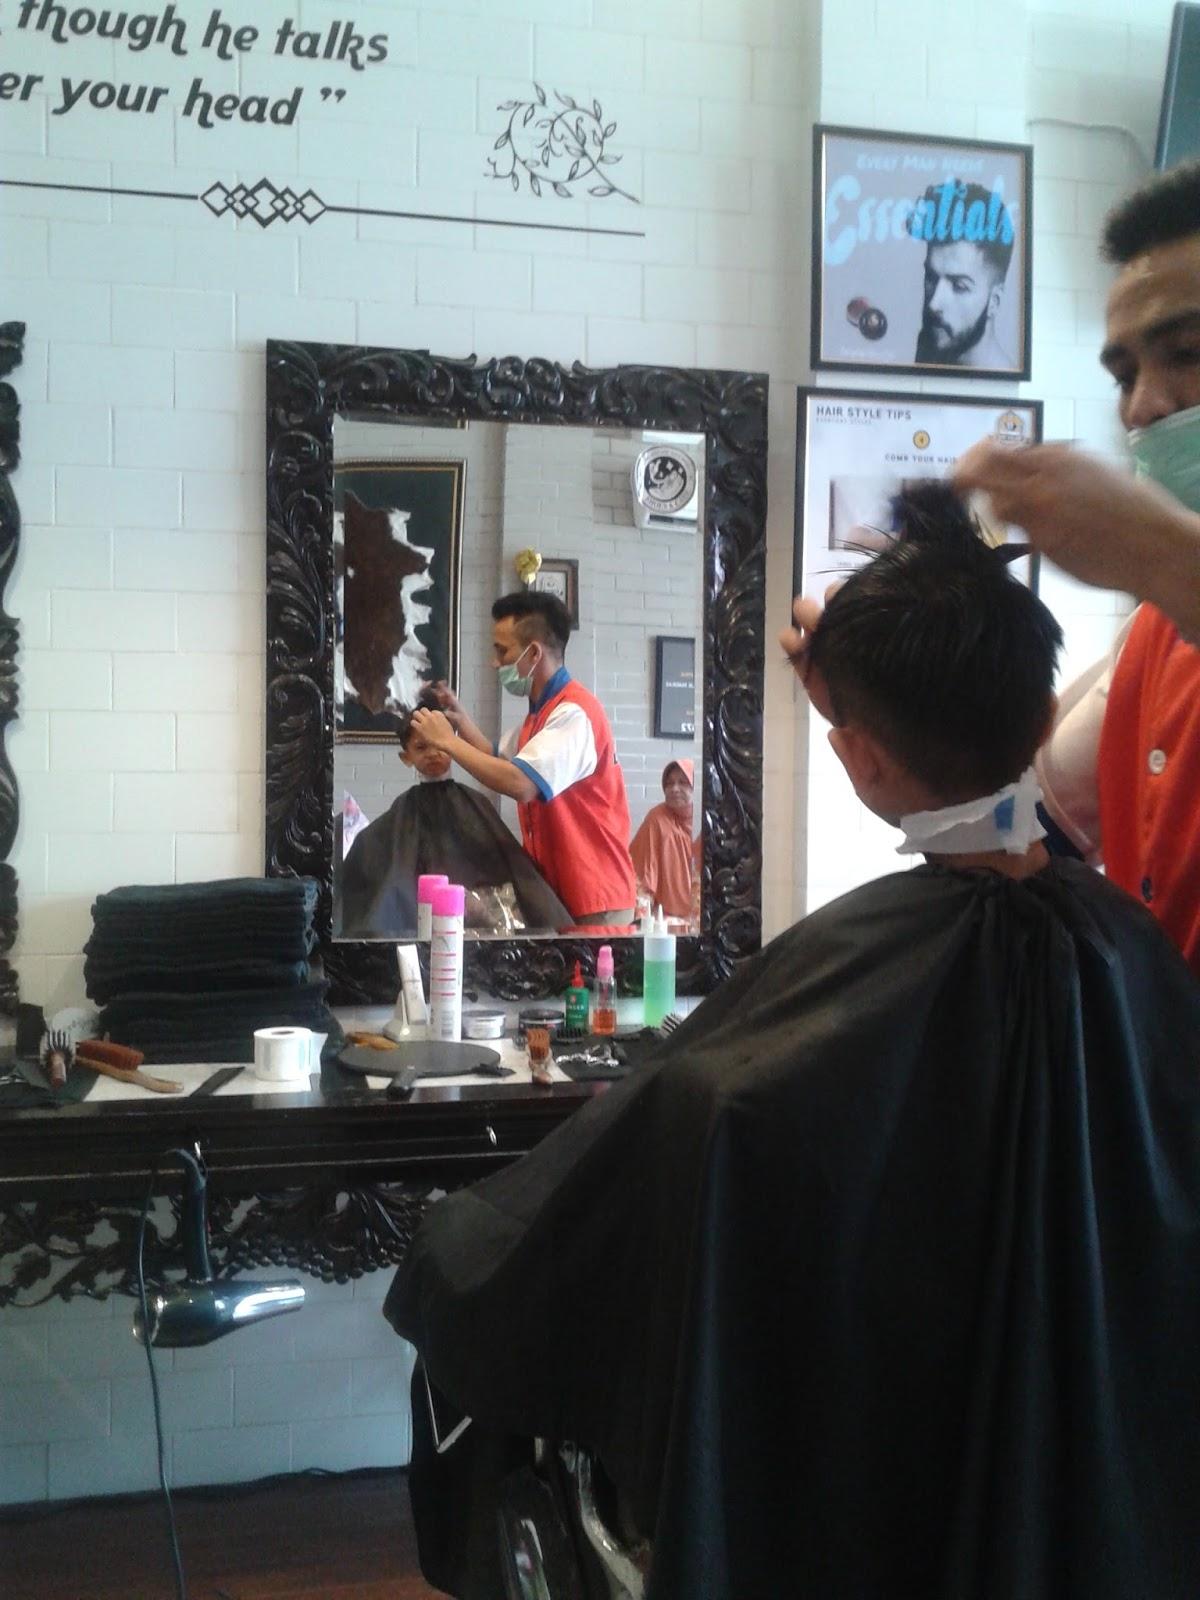 Interior tematik akan membuat para pengunjung nyaman ketika sedang pangkas di sir salon